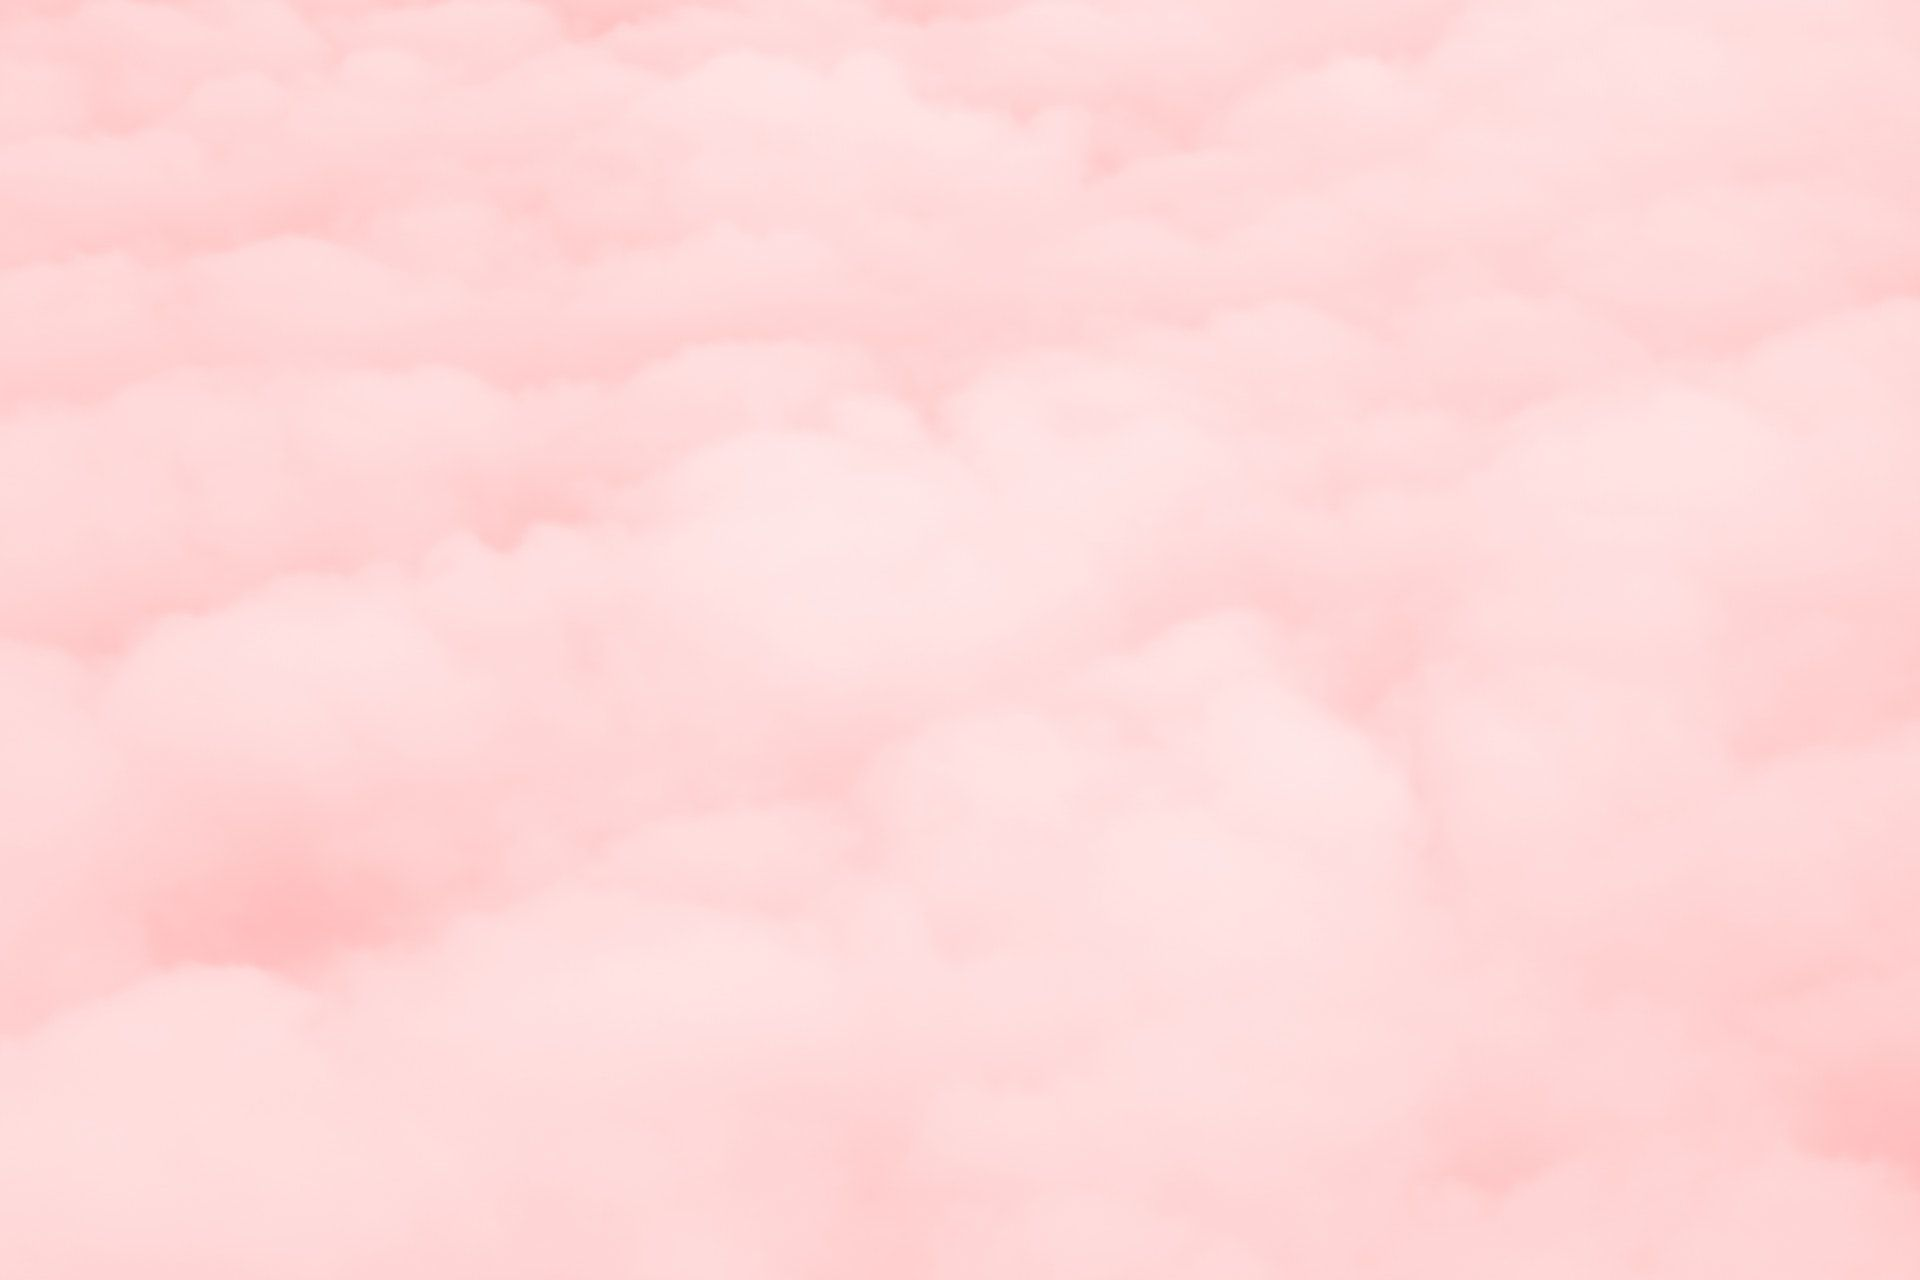 عکس زمینه ابرهای صورتی پس زمینه